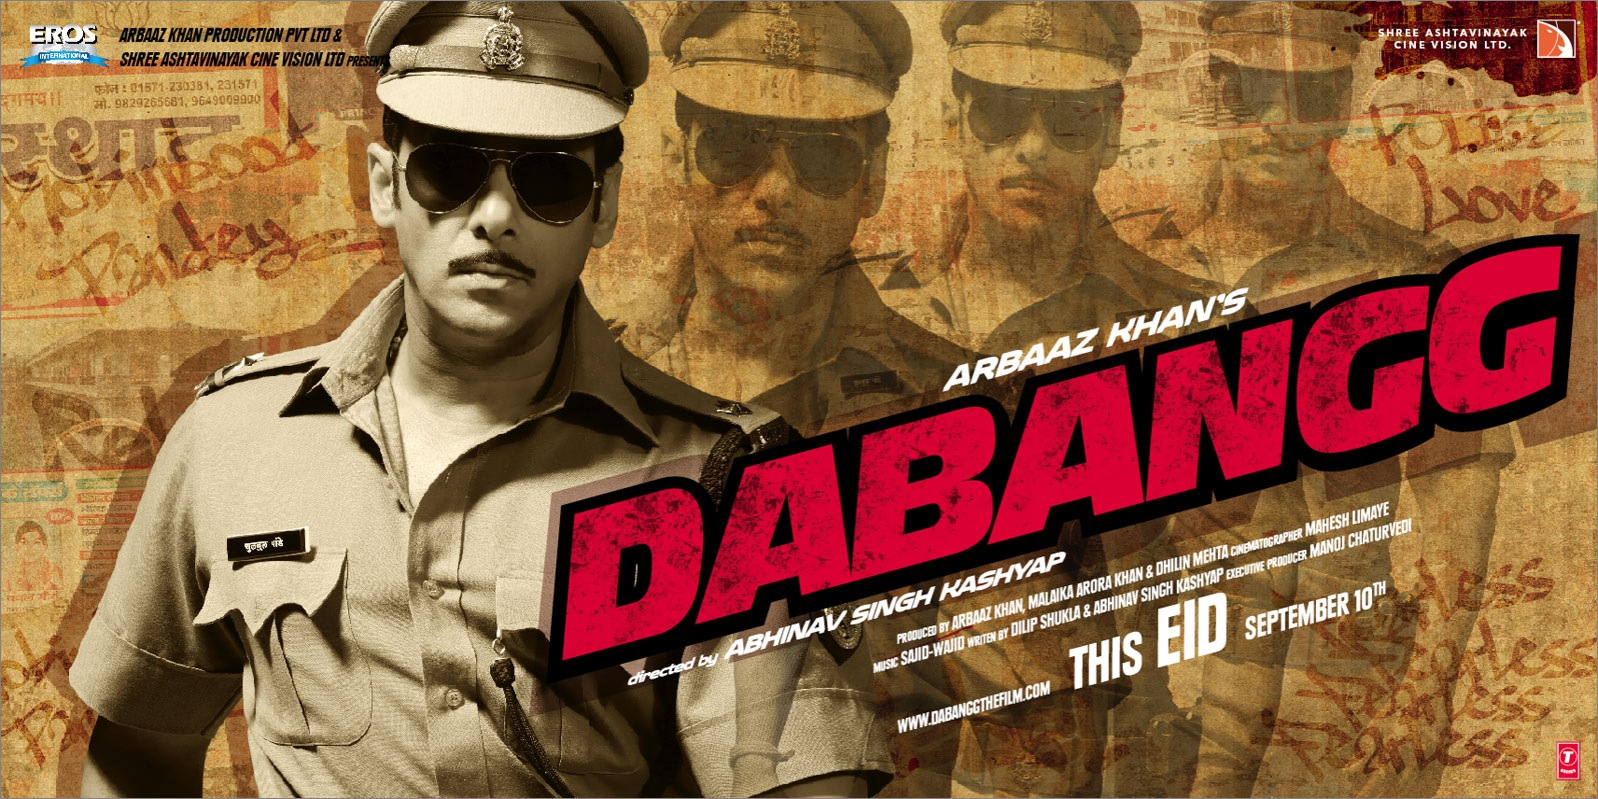 Dabangg Movie Poster